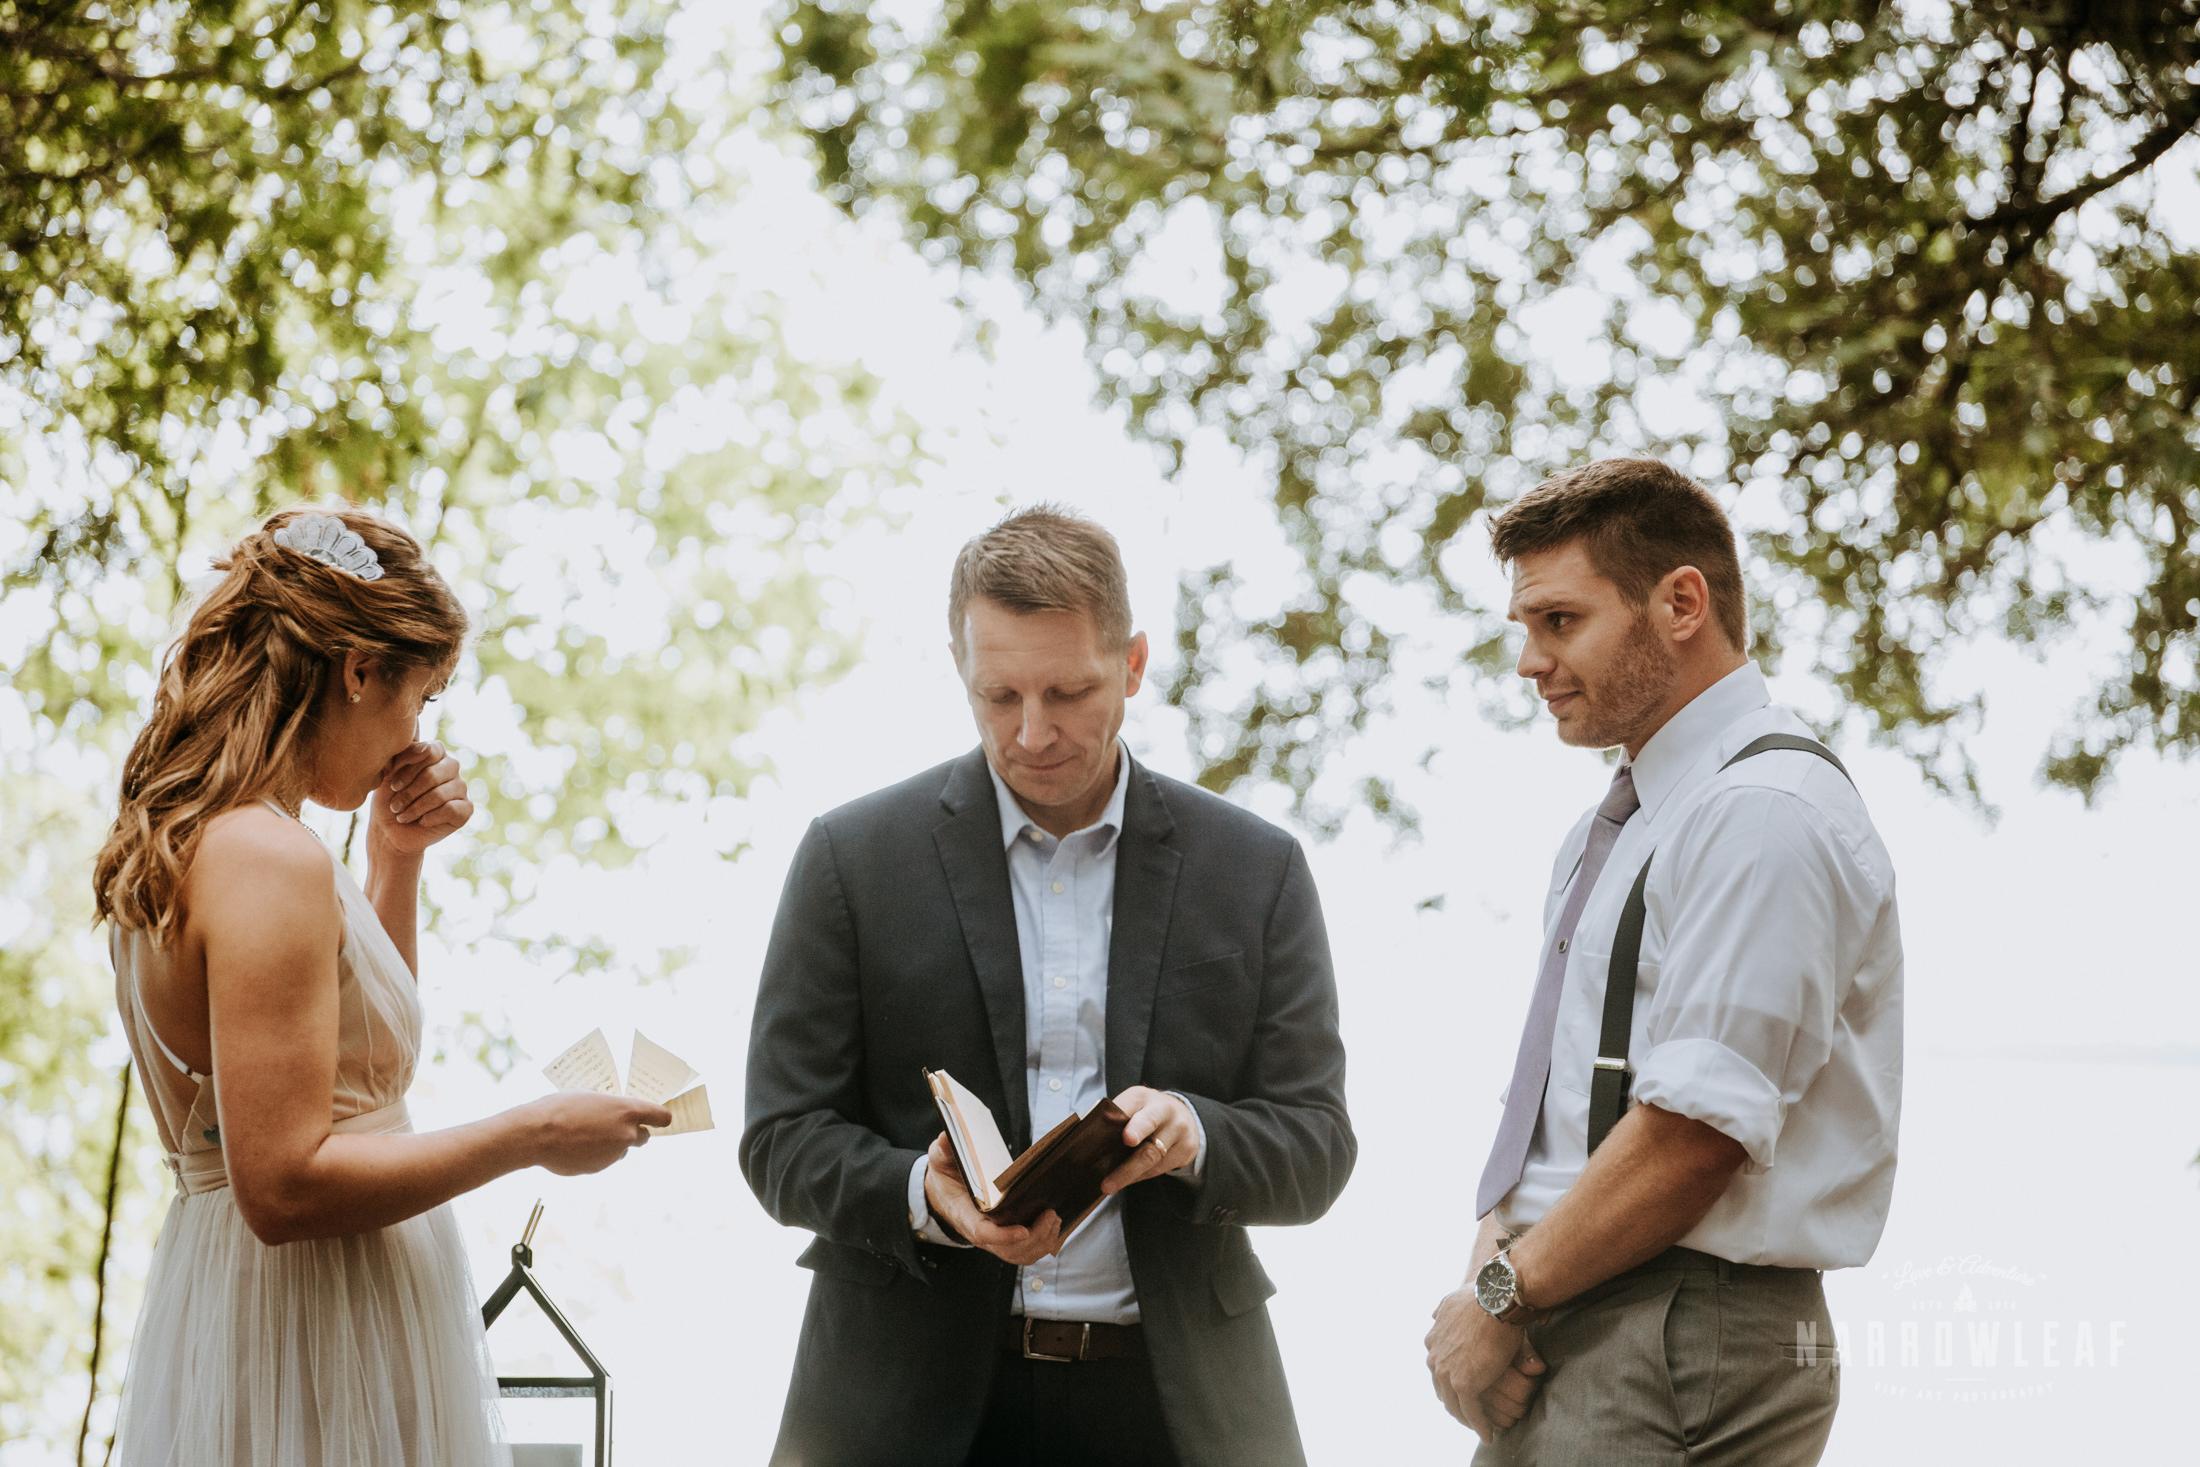 door-county-wedding-photographer-in-the-woods-Narrowleaf_Love_and_Adventure_Photography-8078.jpg